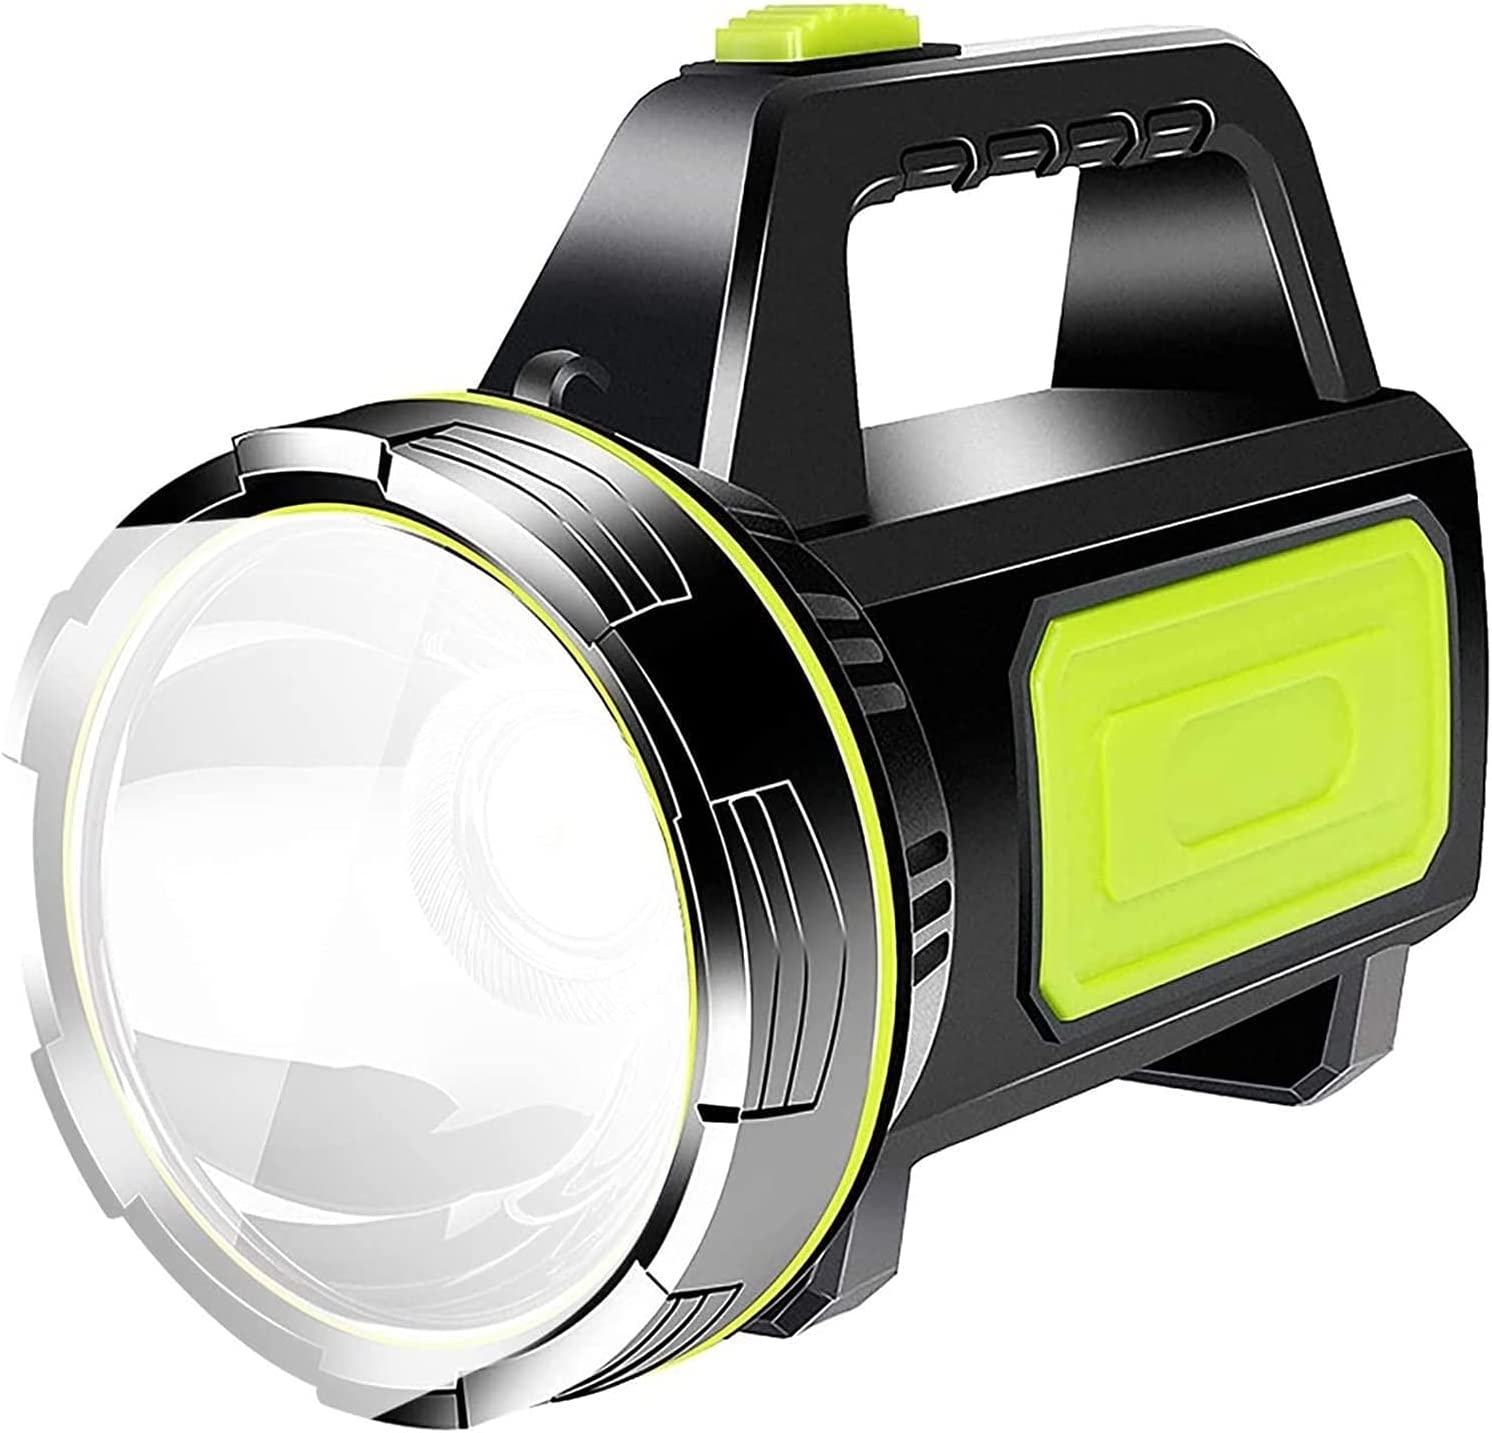 LED Searchlight 2 Modes price 13500LM Finally resale start White Ligh Handheld Bright Light